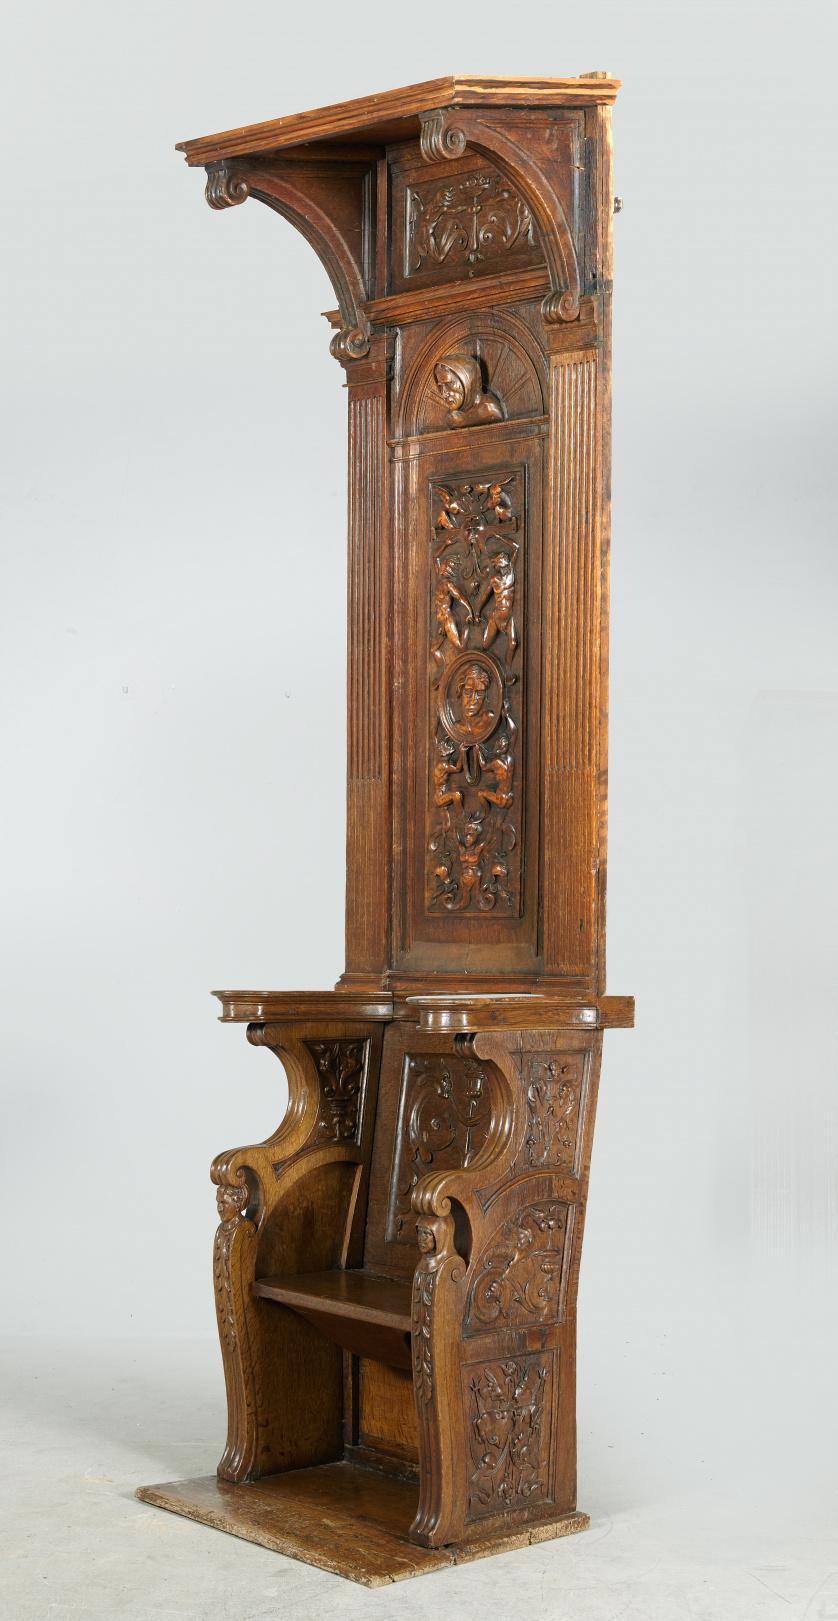 Silla alta de coro, en madera de roble.Trabajo español, S.